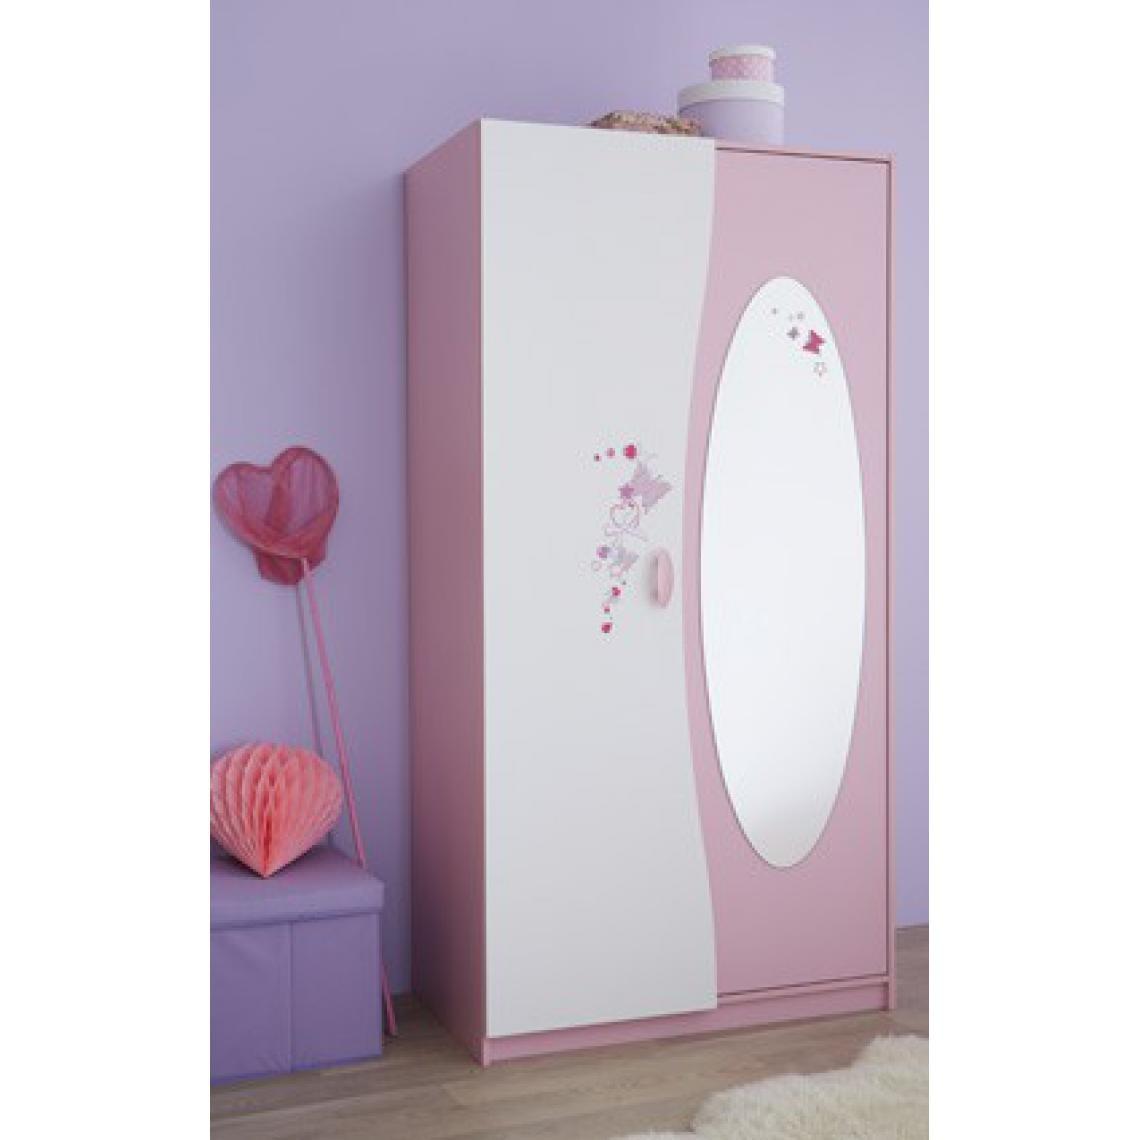 Armoire 2 Portes Avec Miroir Rose Pastel Blanc Perle Piama 3 Suisses